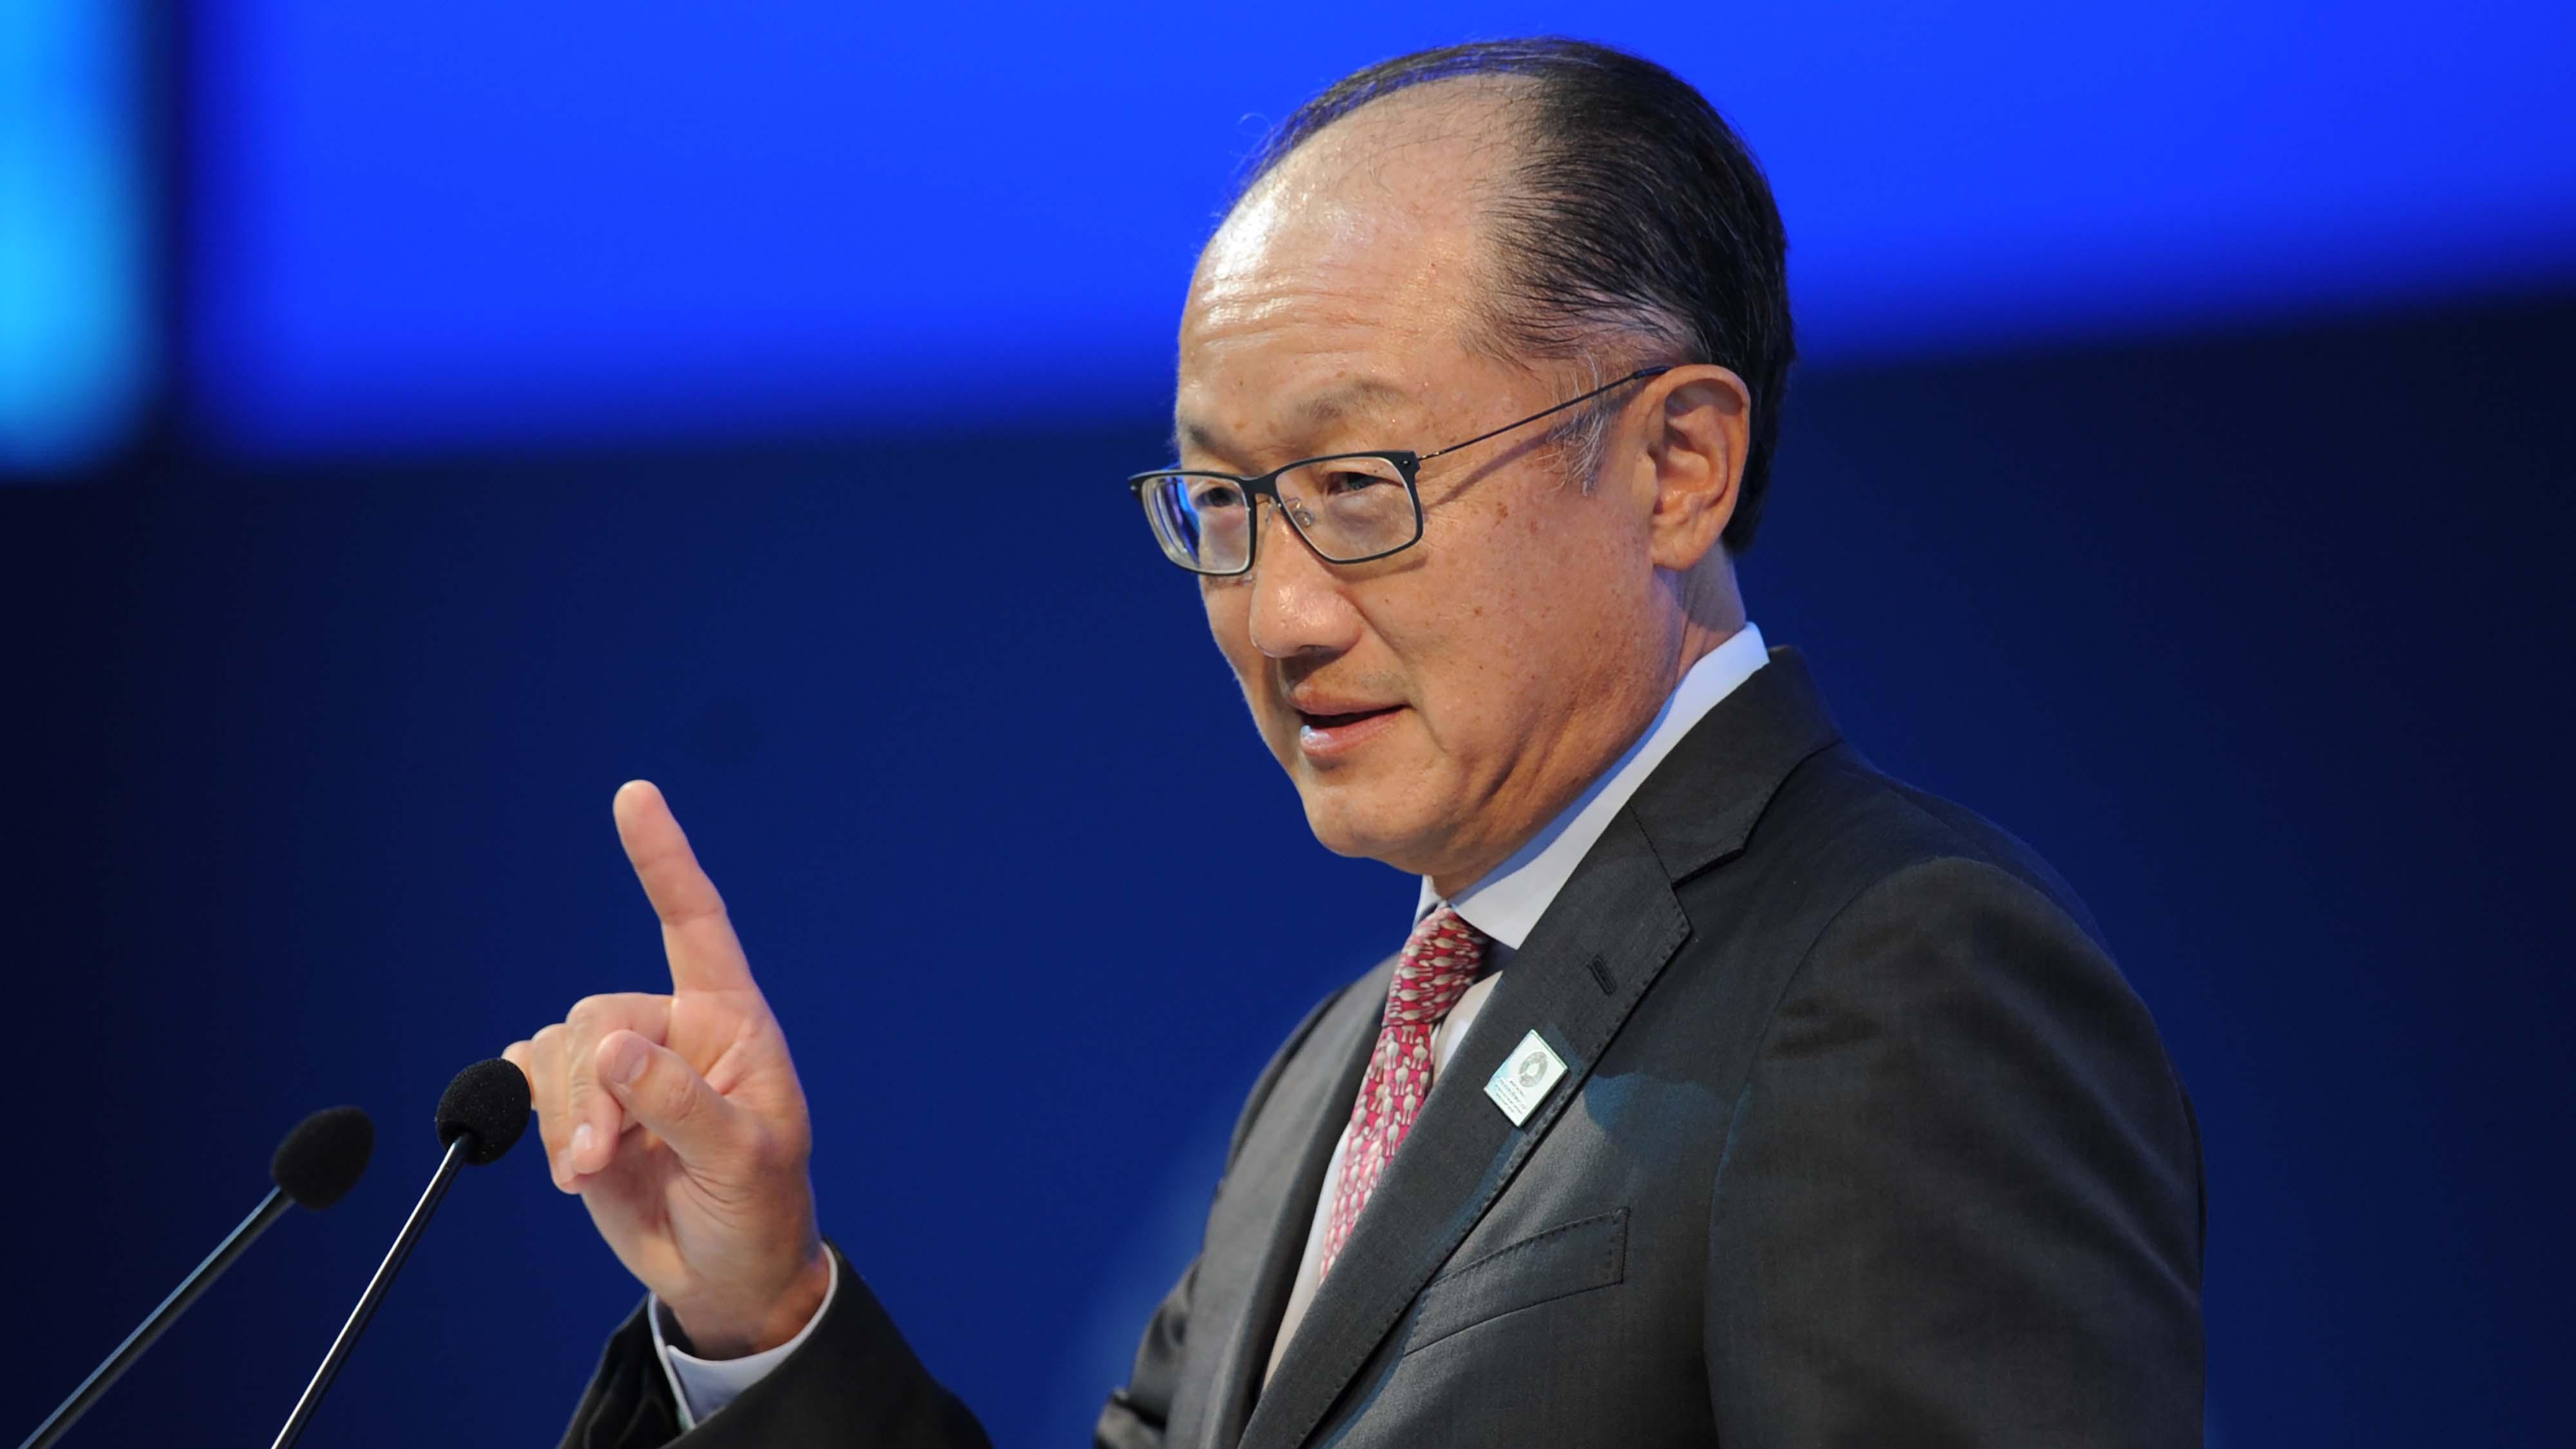 El presidente del Banco Mundial Jim Yong Kim